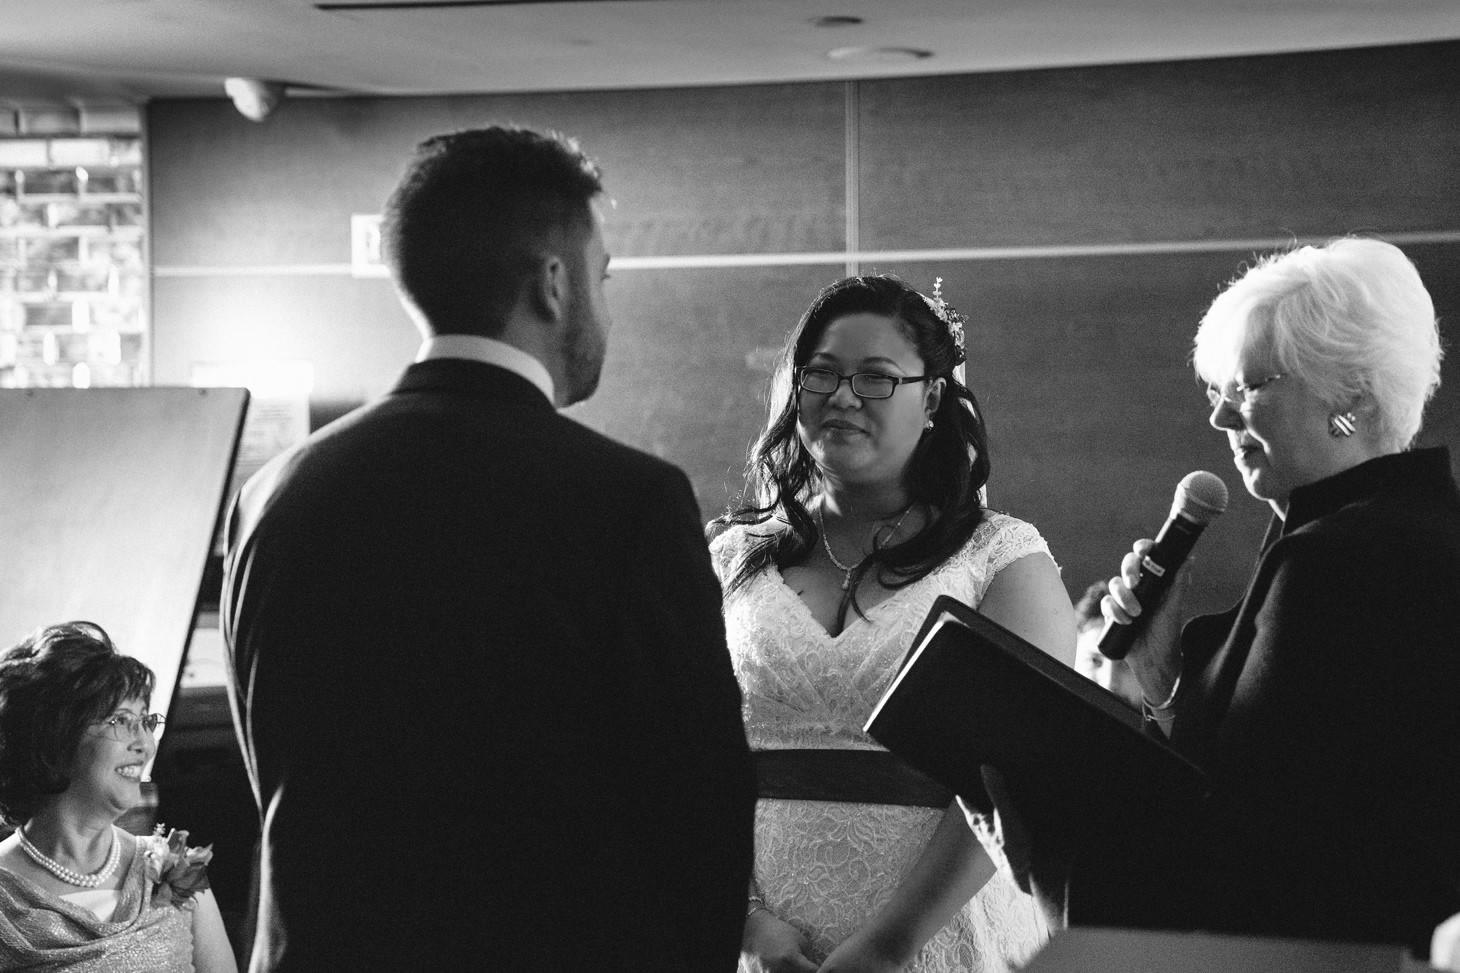 034-nyc-wedding-portrait-photographer-times-square-muse-hotel-winter-wedding-smitten-chickens.jpg